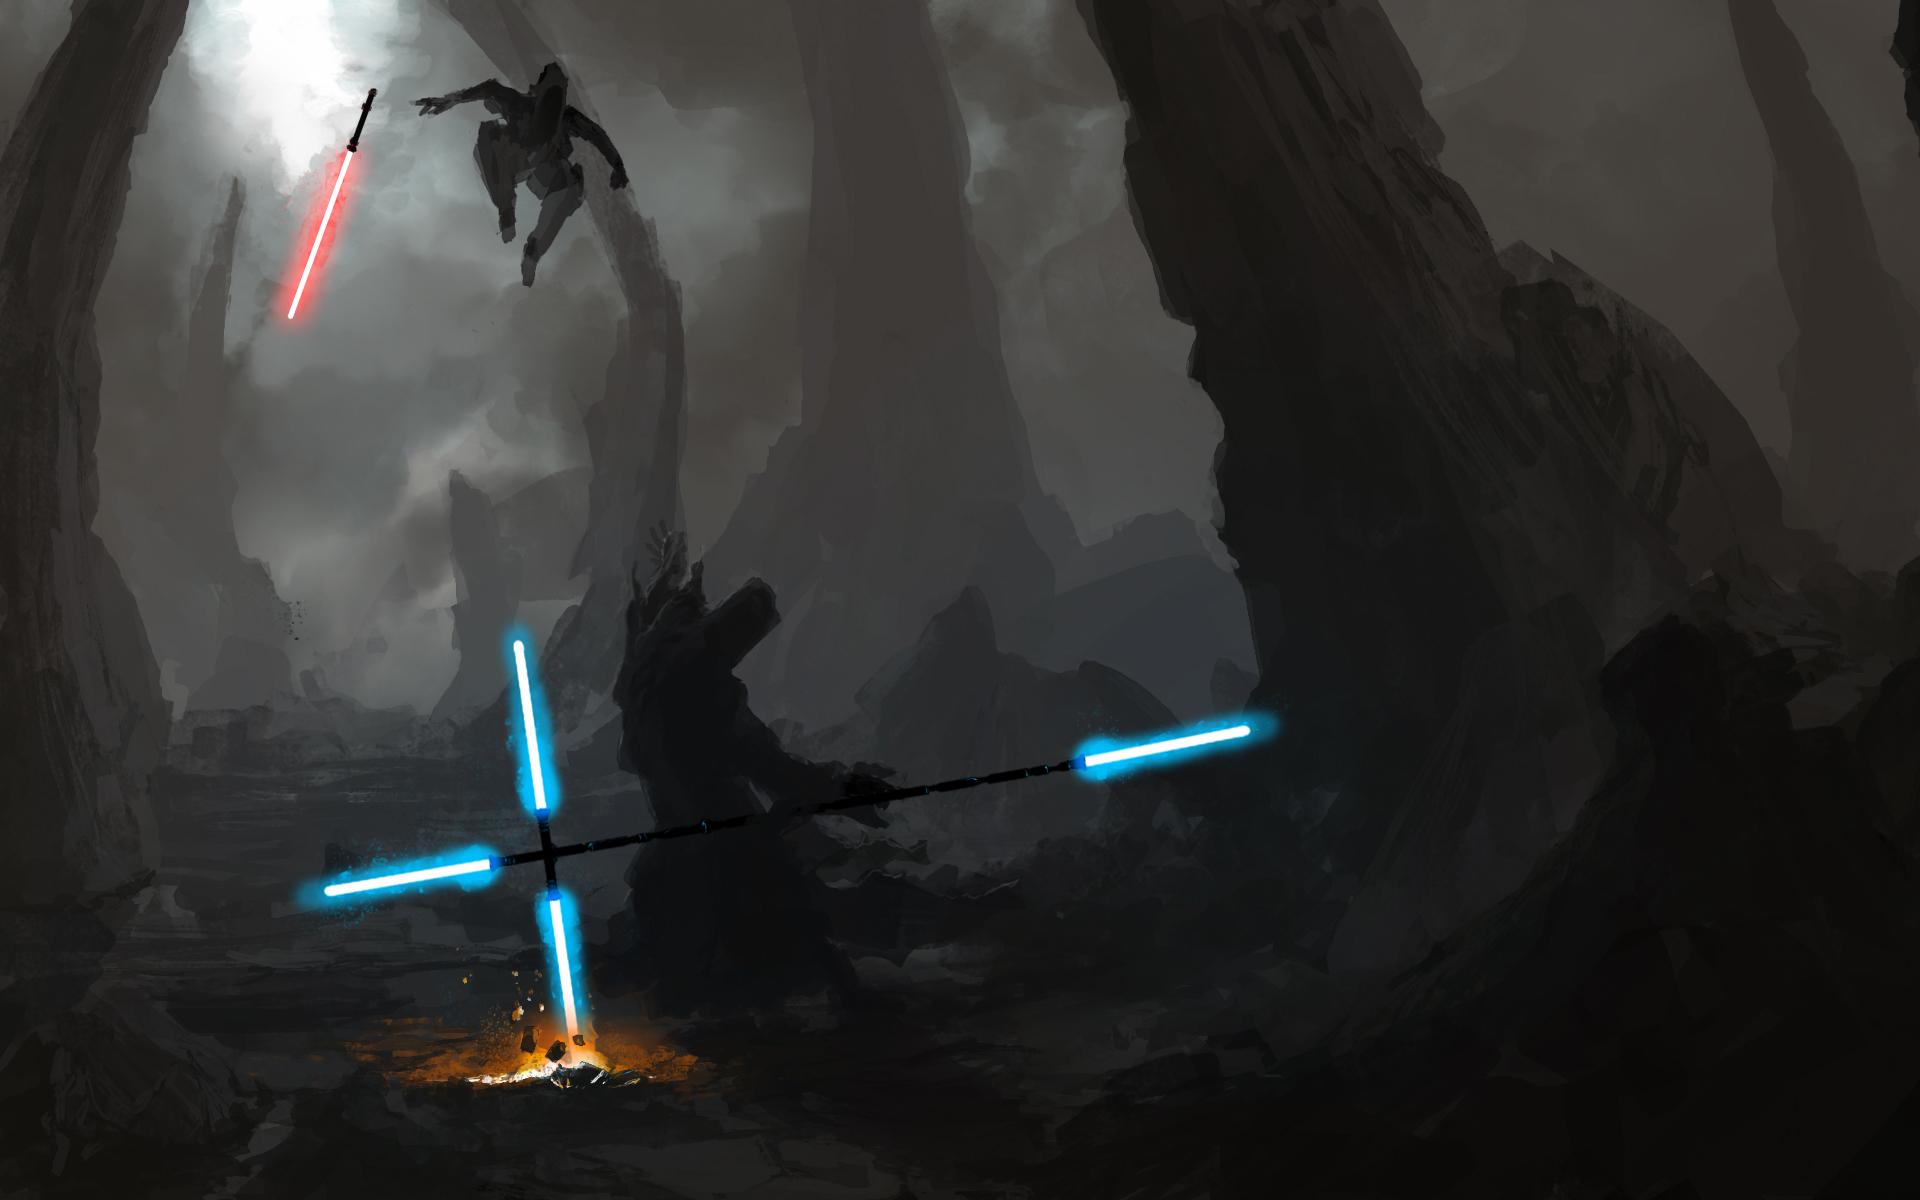 General 1920x1200 Star Wars sword red blue lightsaber artwork Sith Jedi science fiction cyan